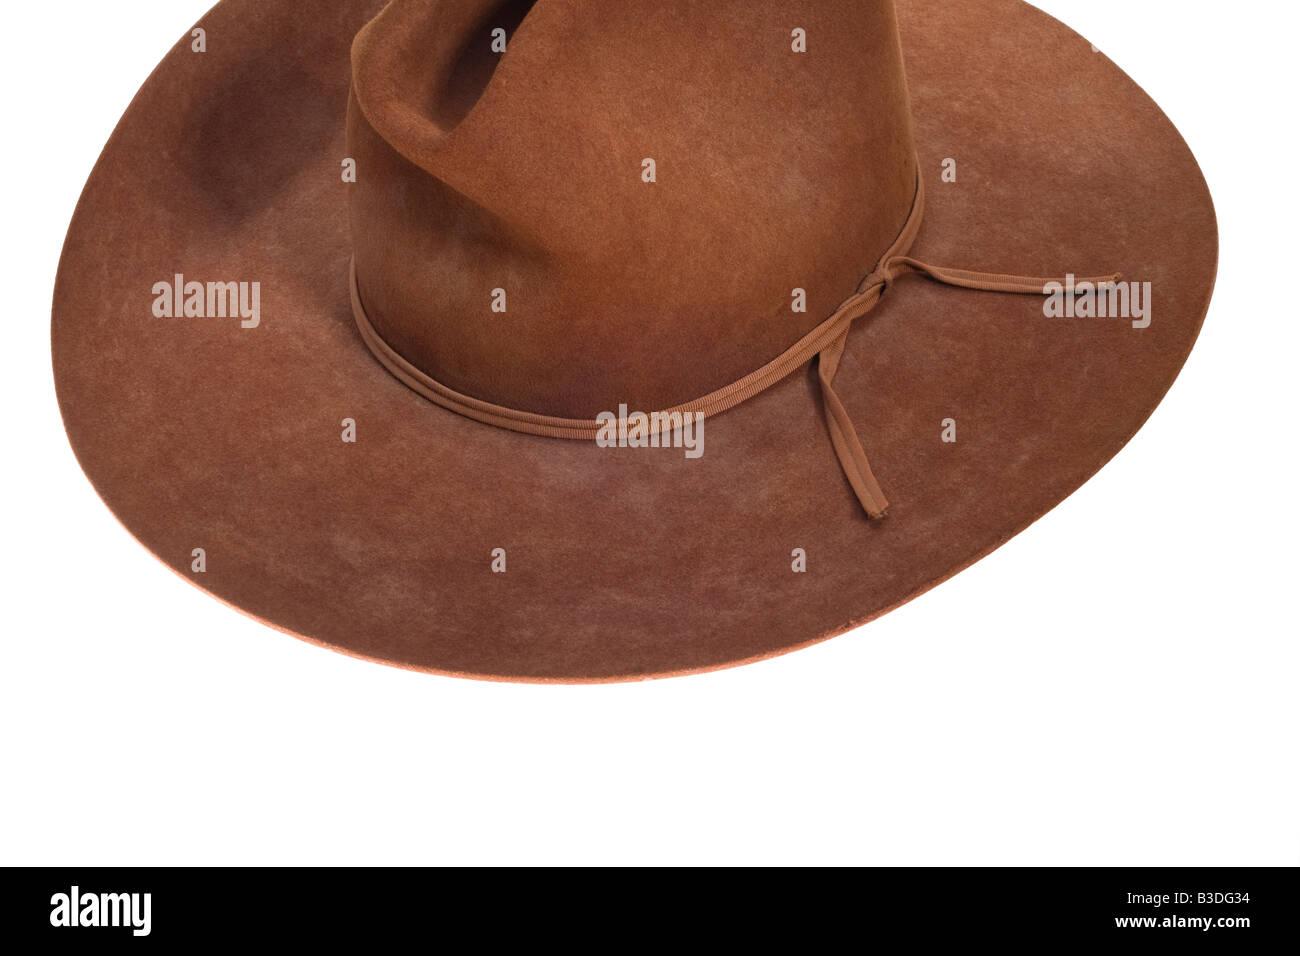 Cowboy Hat Nobody Stock Photos   Cowboy Hat Nobody Stock Images - Alamy 22e88263f115